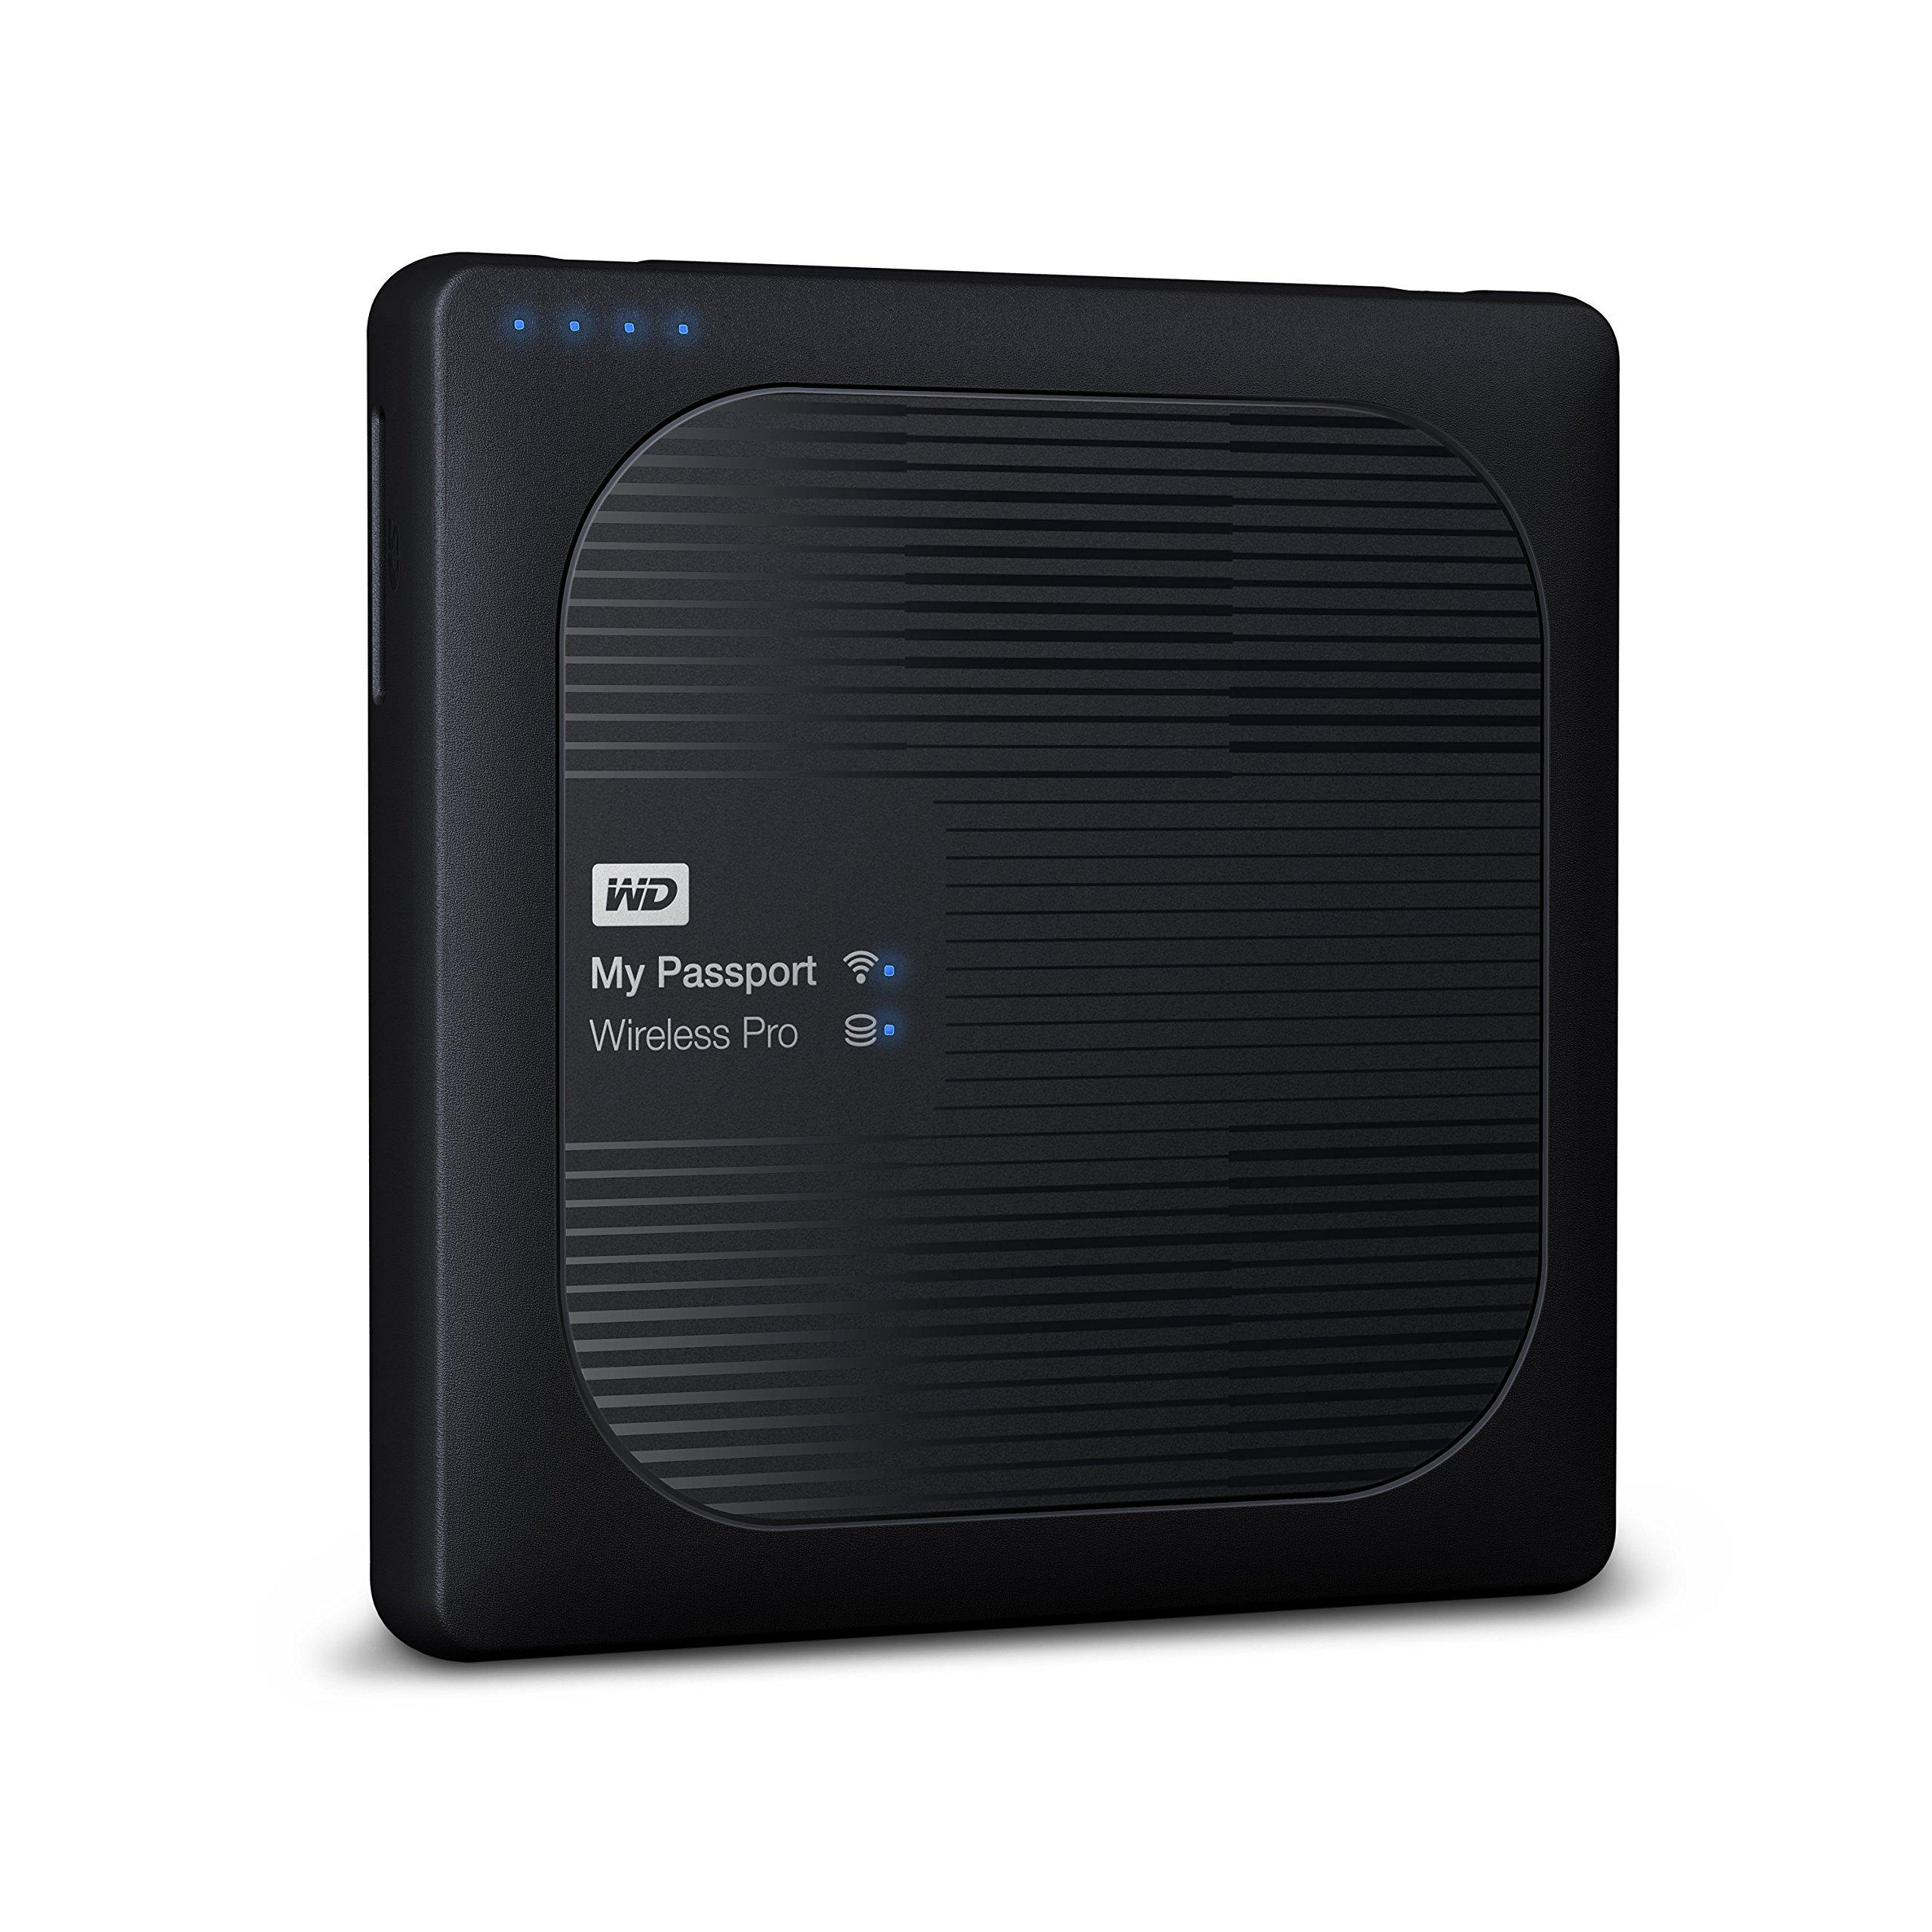 Western Digital 西部数据 3TB My Passport Wireless Pro便携式外置硬盘 - WIFI USB 3.0 - WDBSMT0030BBK-NESN